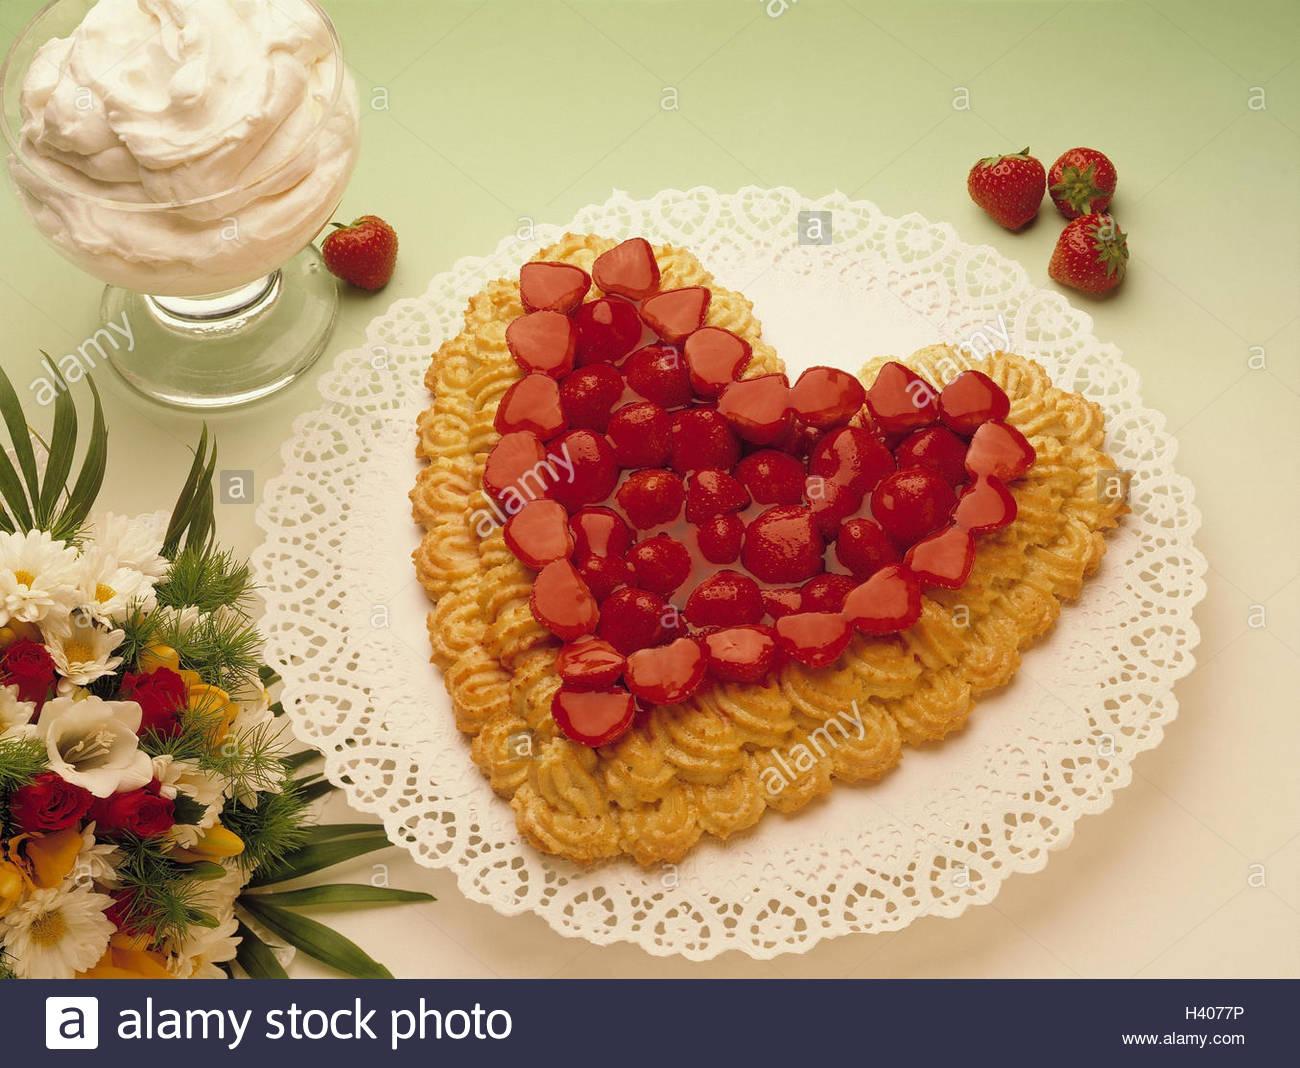 Strawberry cake heartshaped whipped cream bouquet cake cake